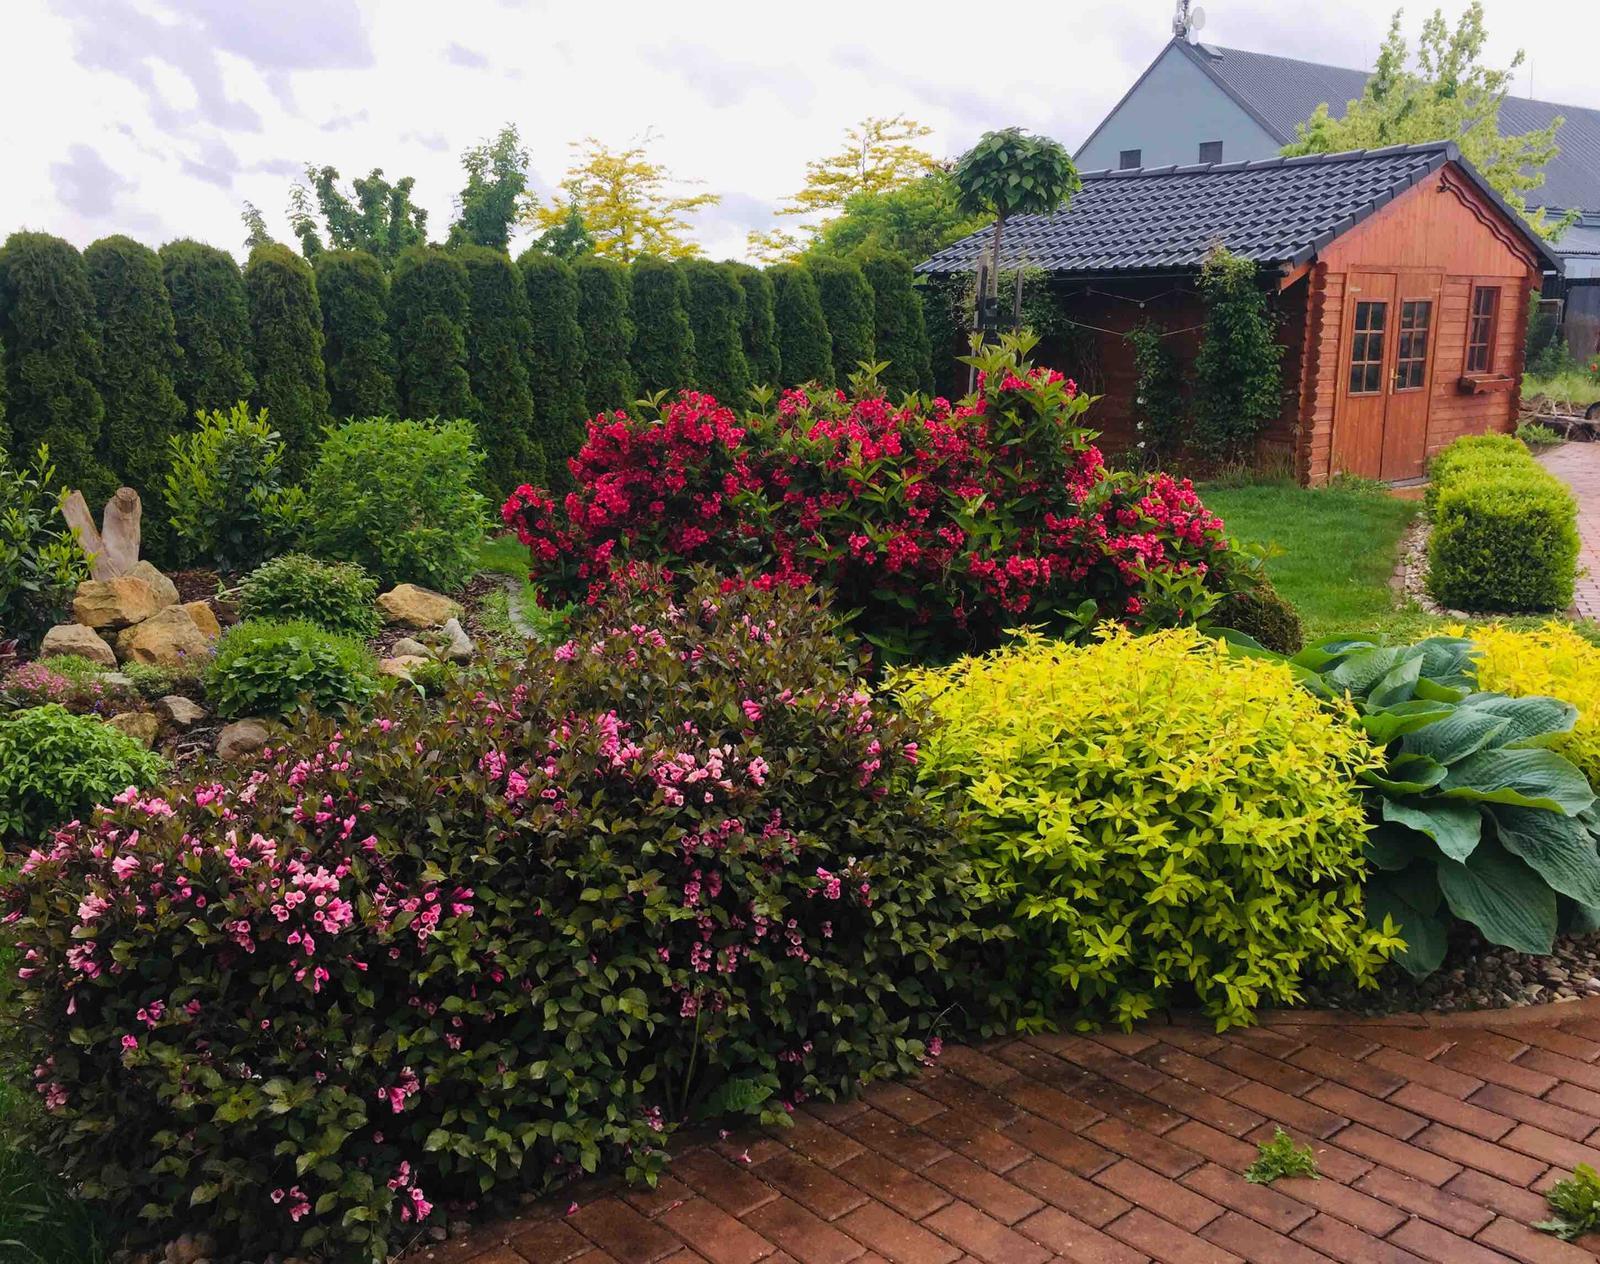 Naše barevná zahrada 🌸 - I když je zataženo, tak v zahradě to hraje barvami 🌸